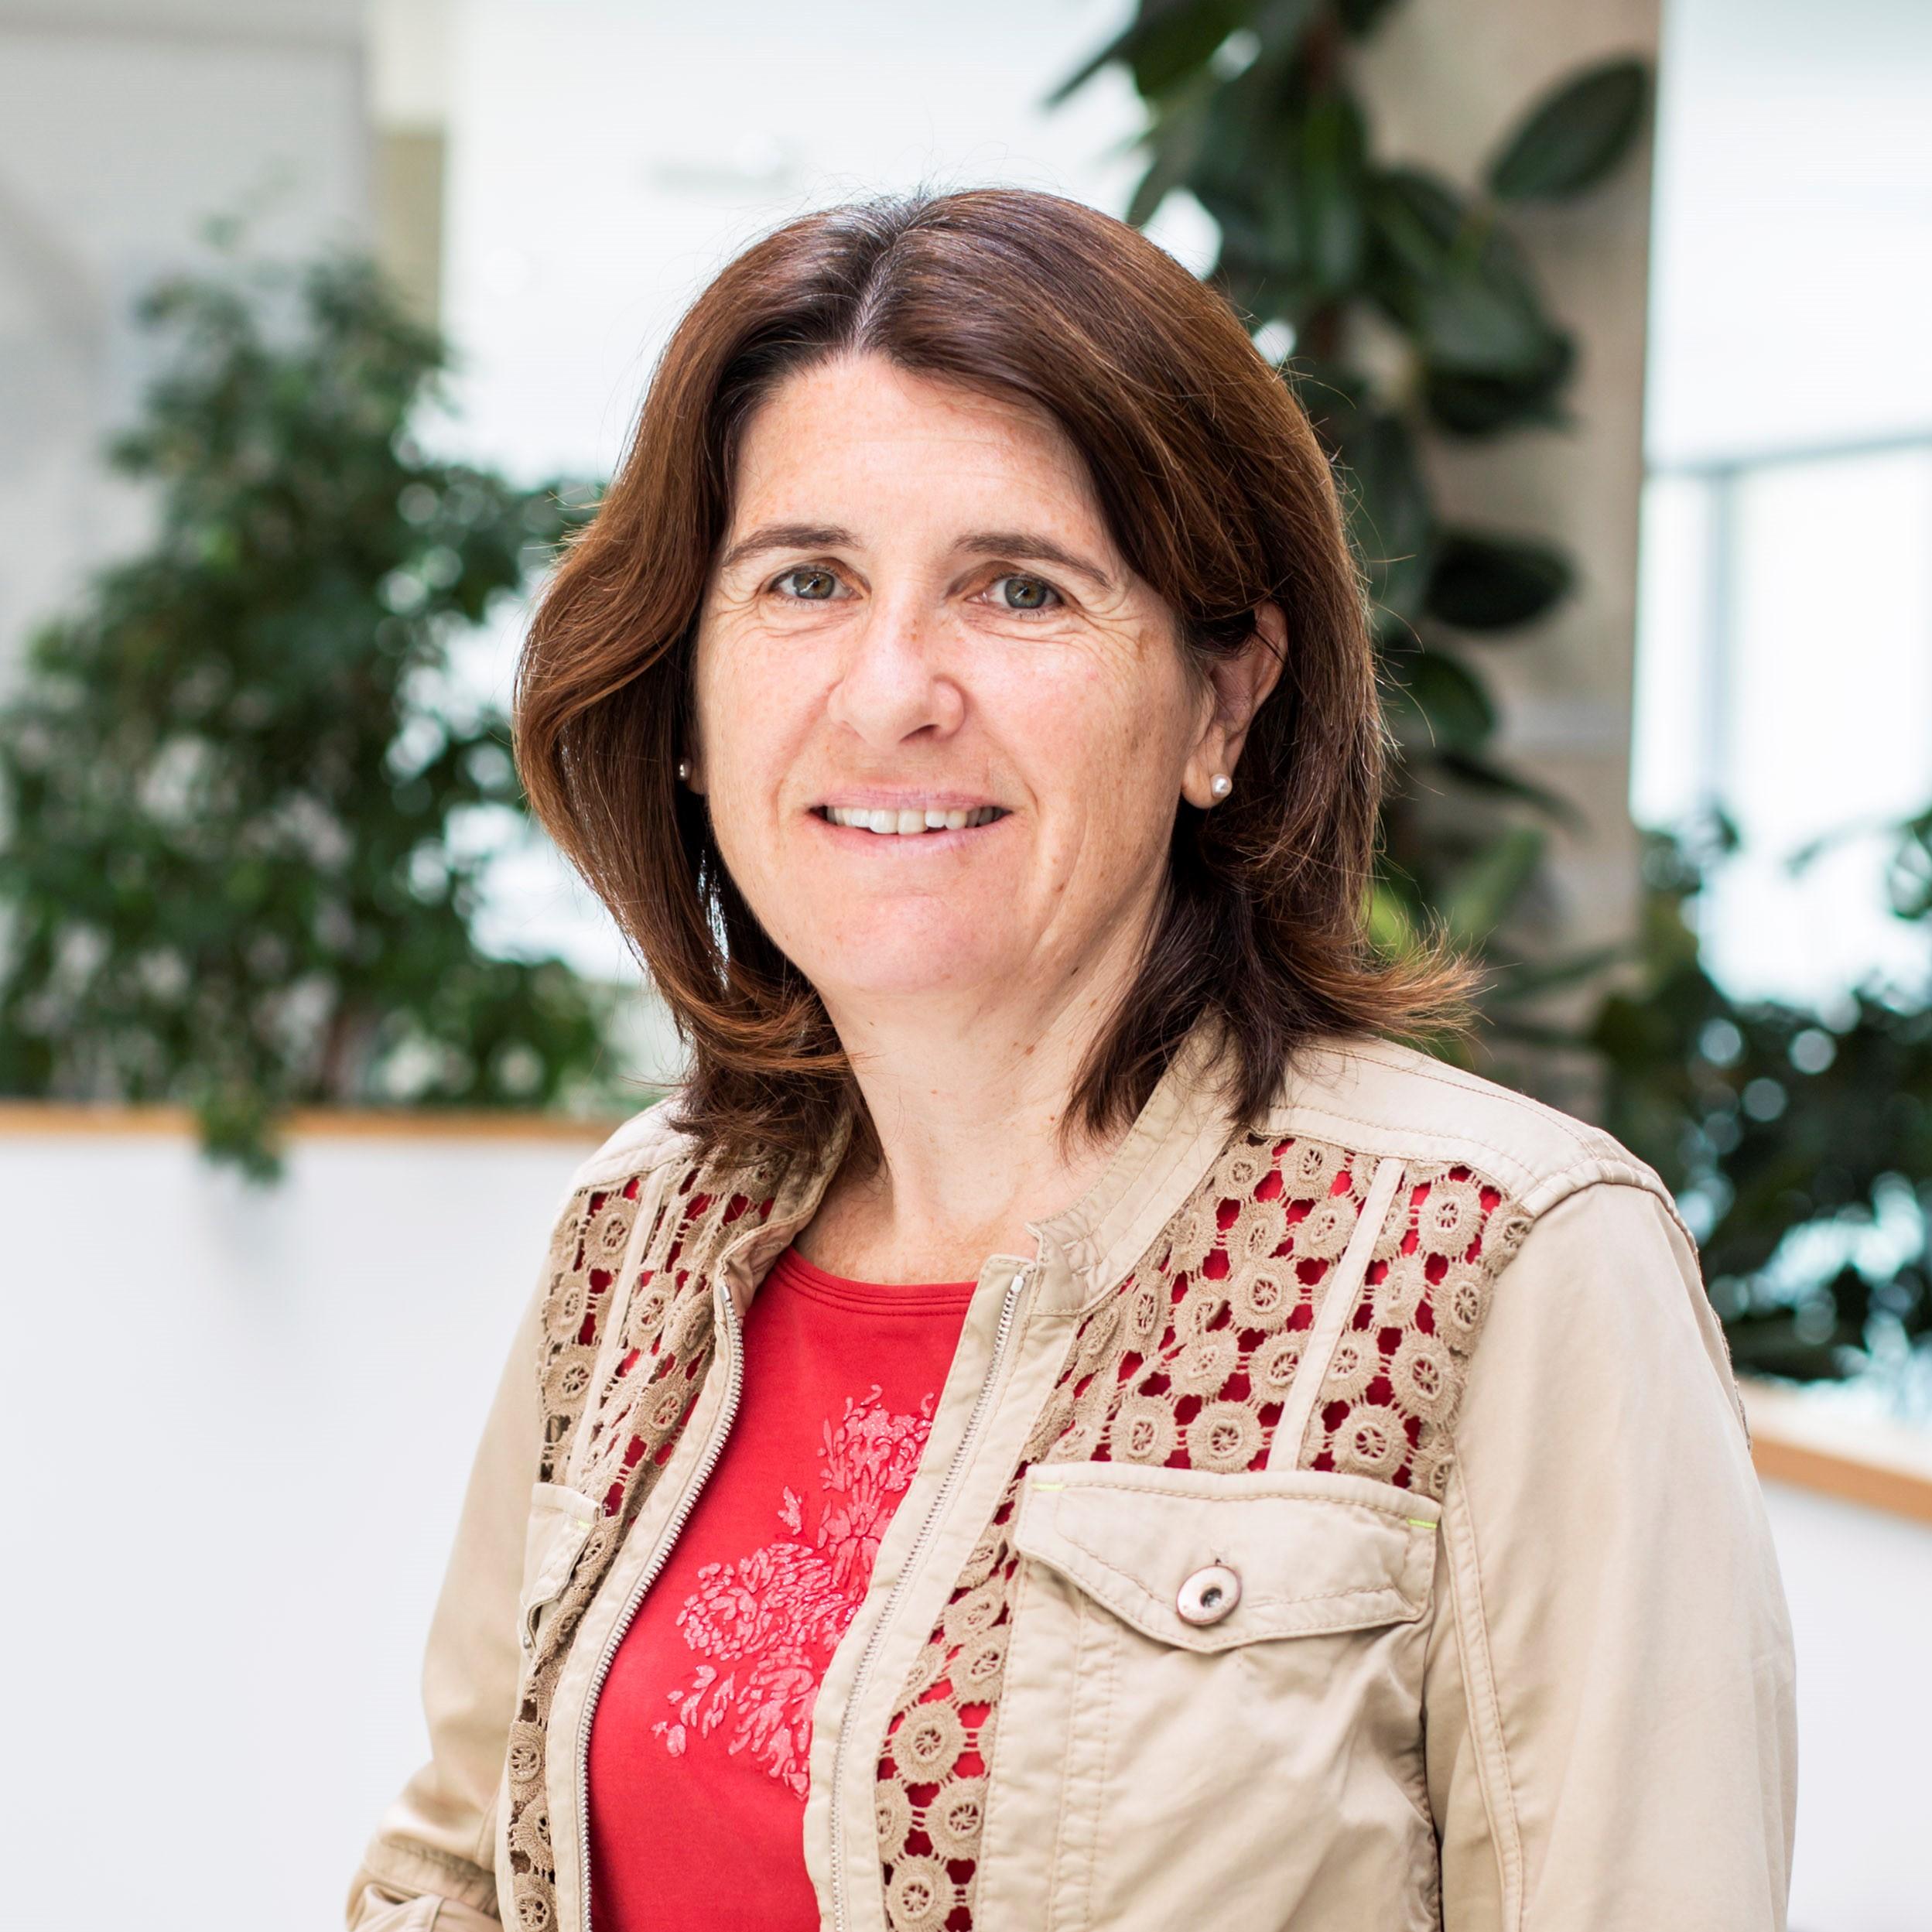 Doris Kiendl ist Vorsitzende des Departments Management.